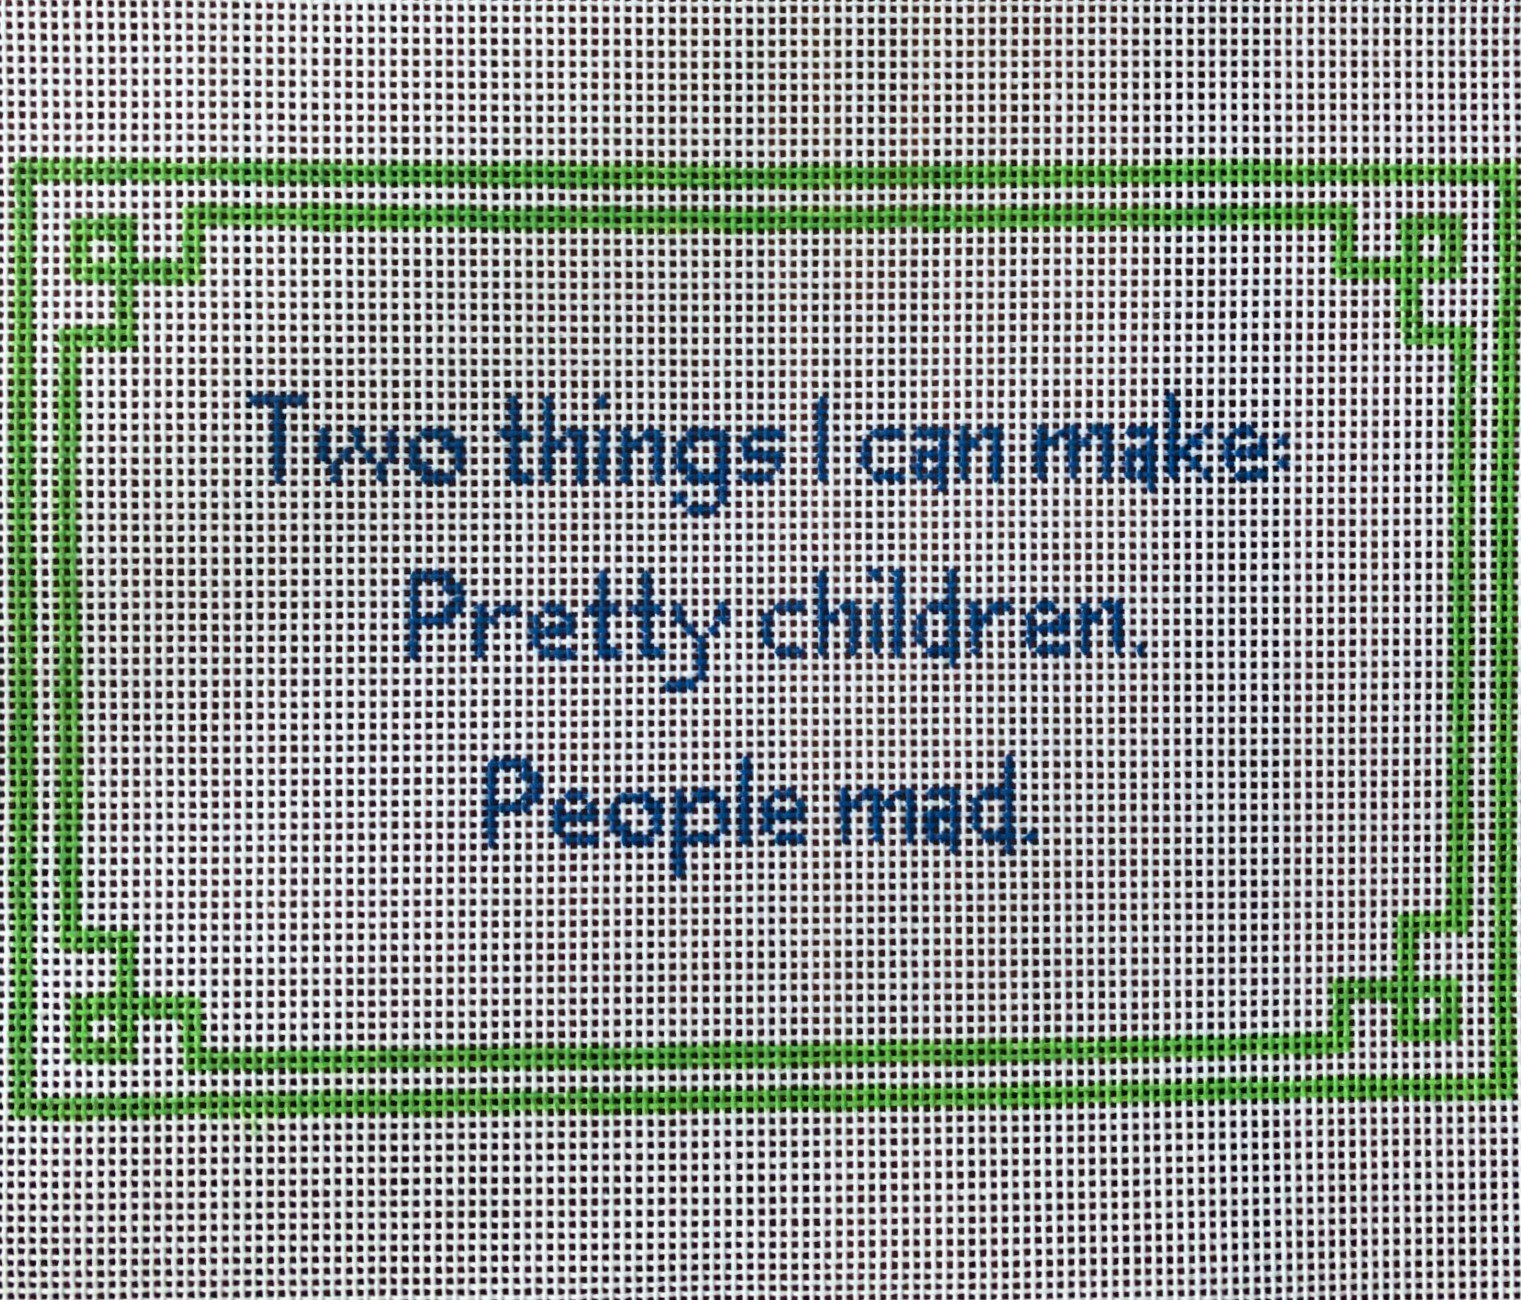 Jessica Tongel - Two Things I Can Make...